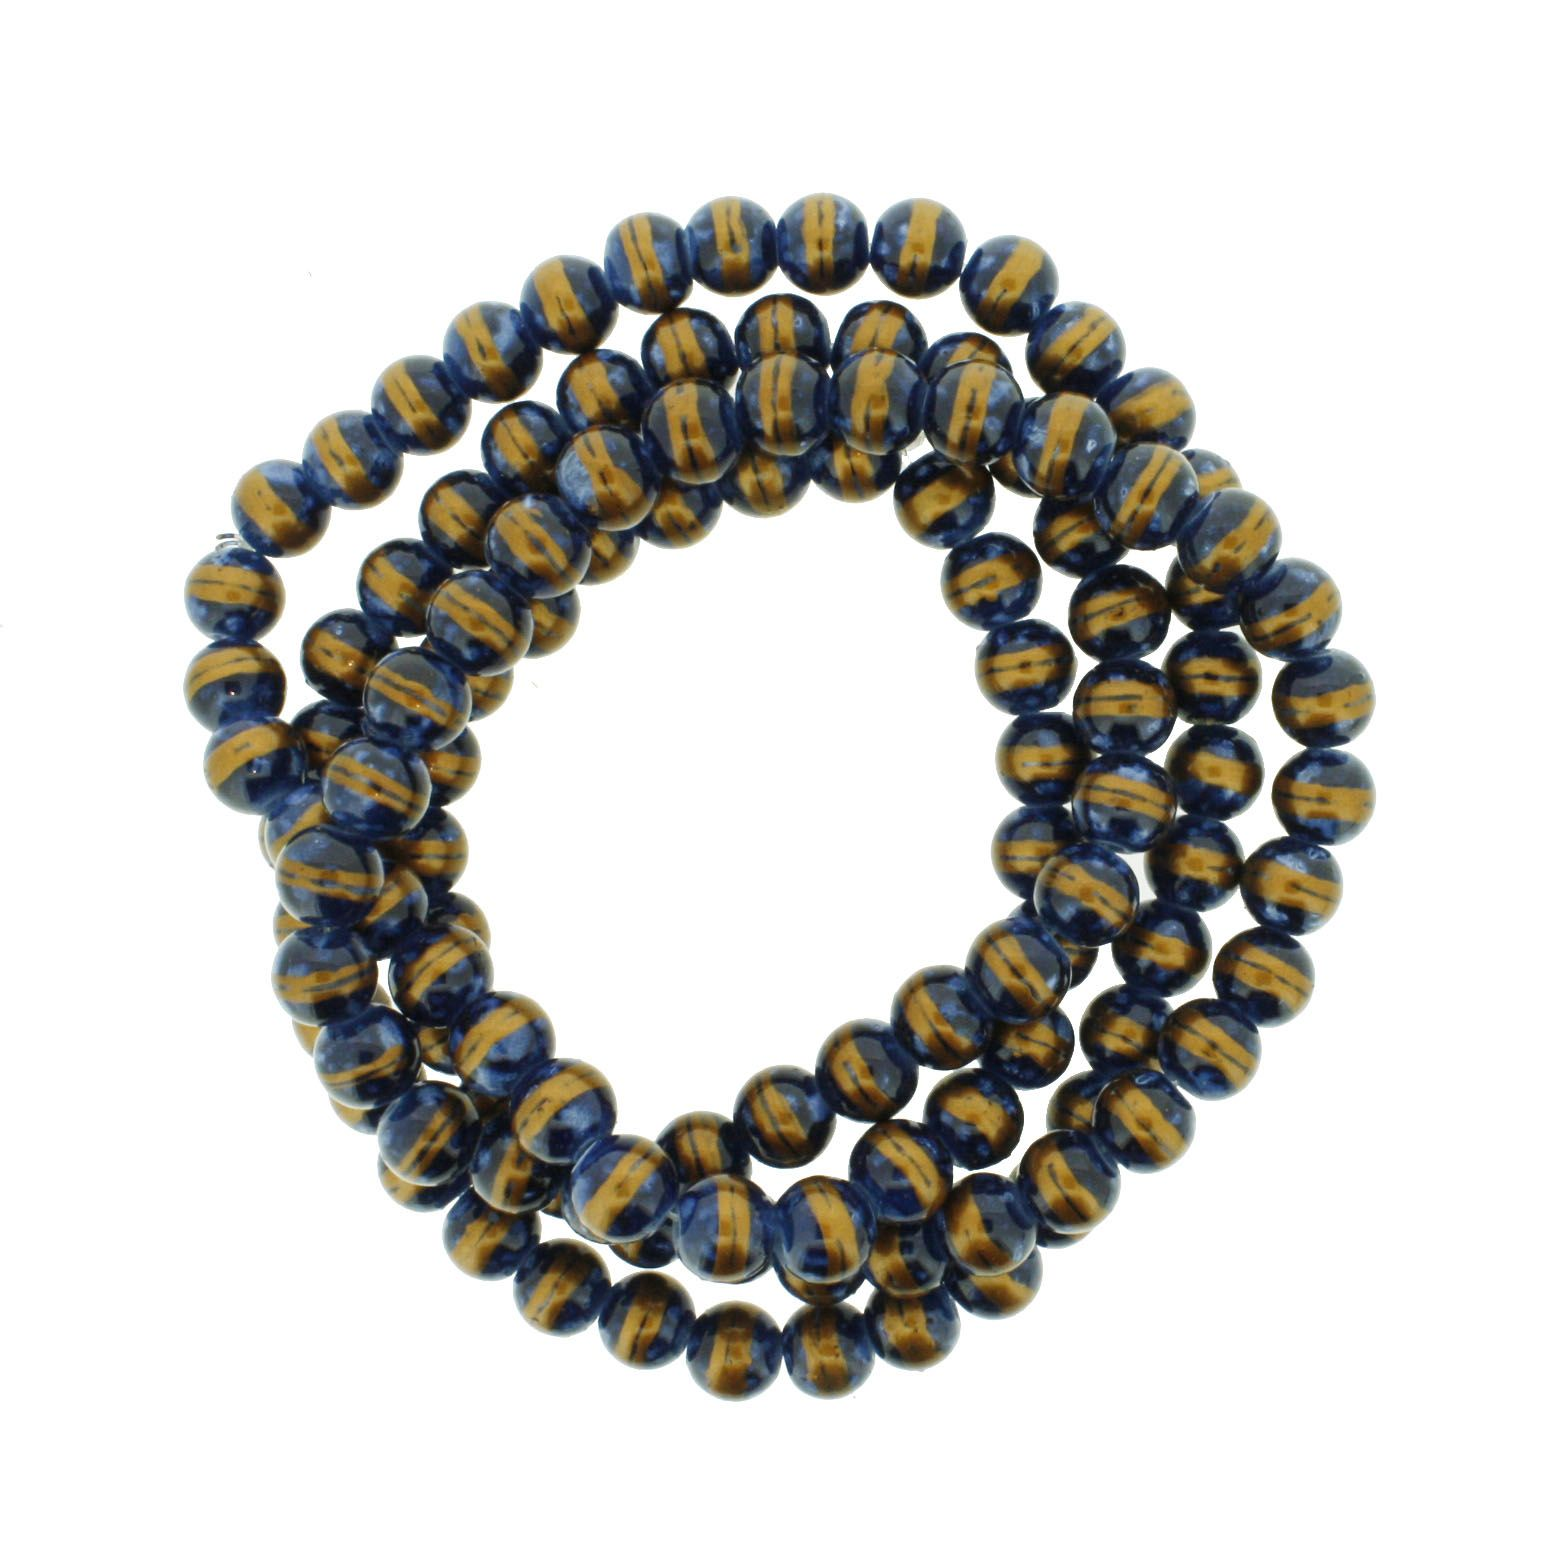 Fio de Contas Pintadas - Azul e Faixa Dourada - 8mm  - Universo Religioso® - Artigos de Umbanda e Candomblé